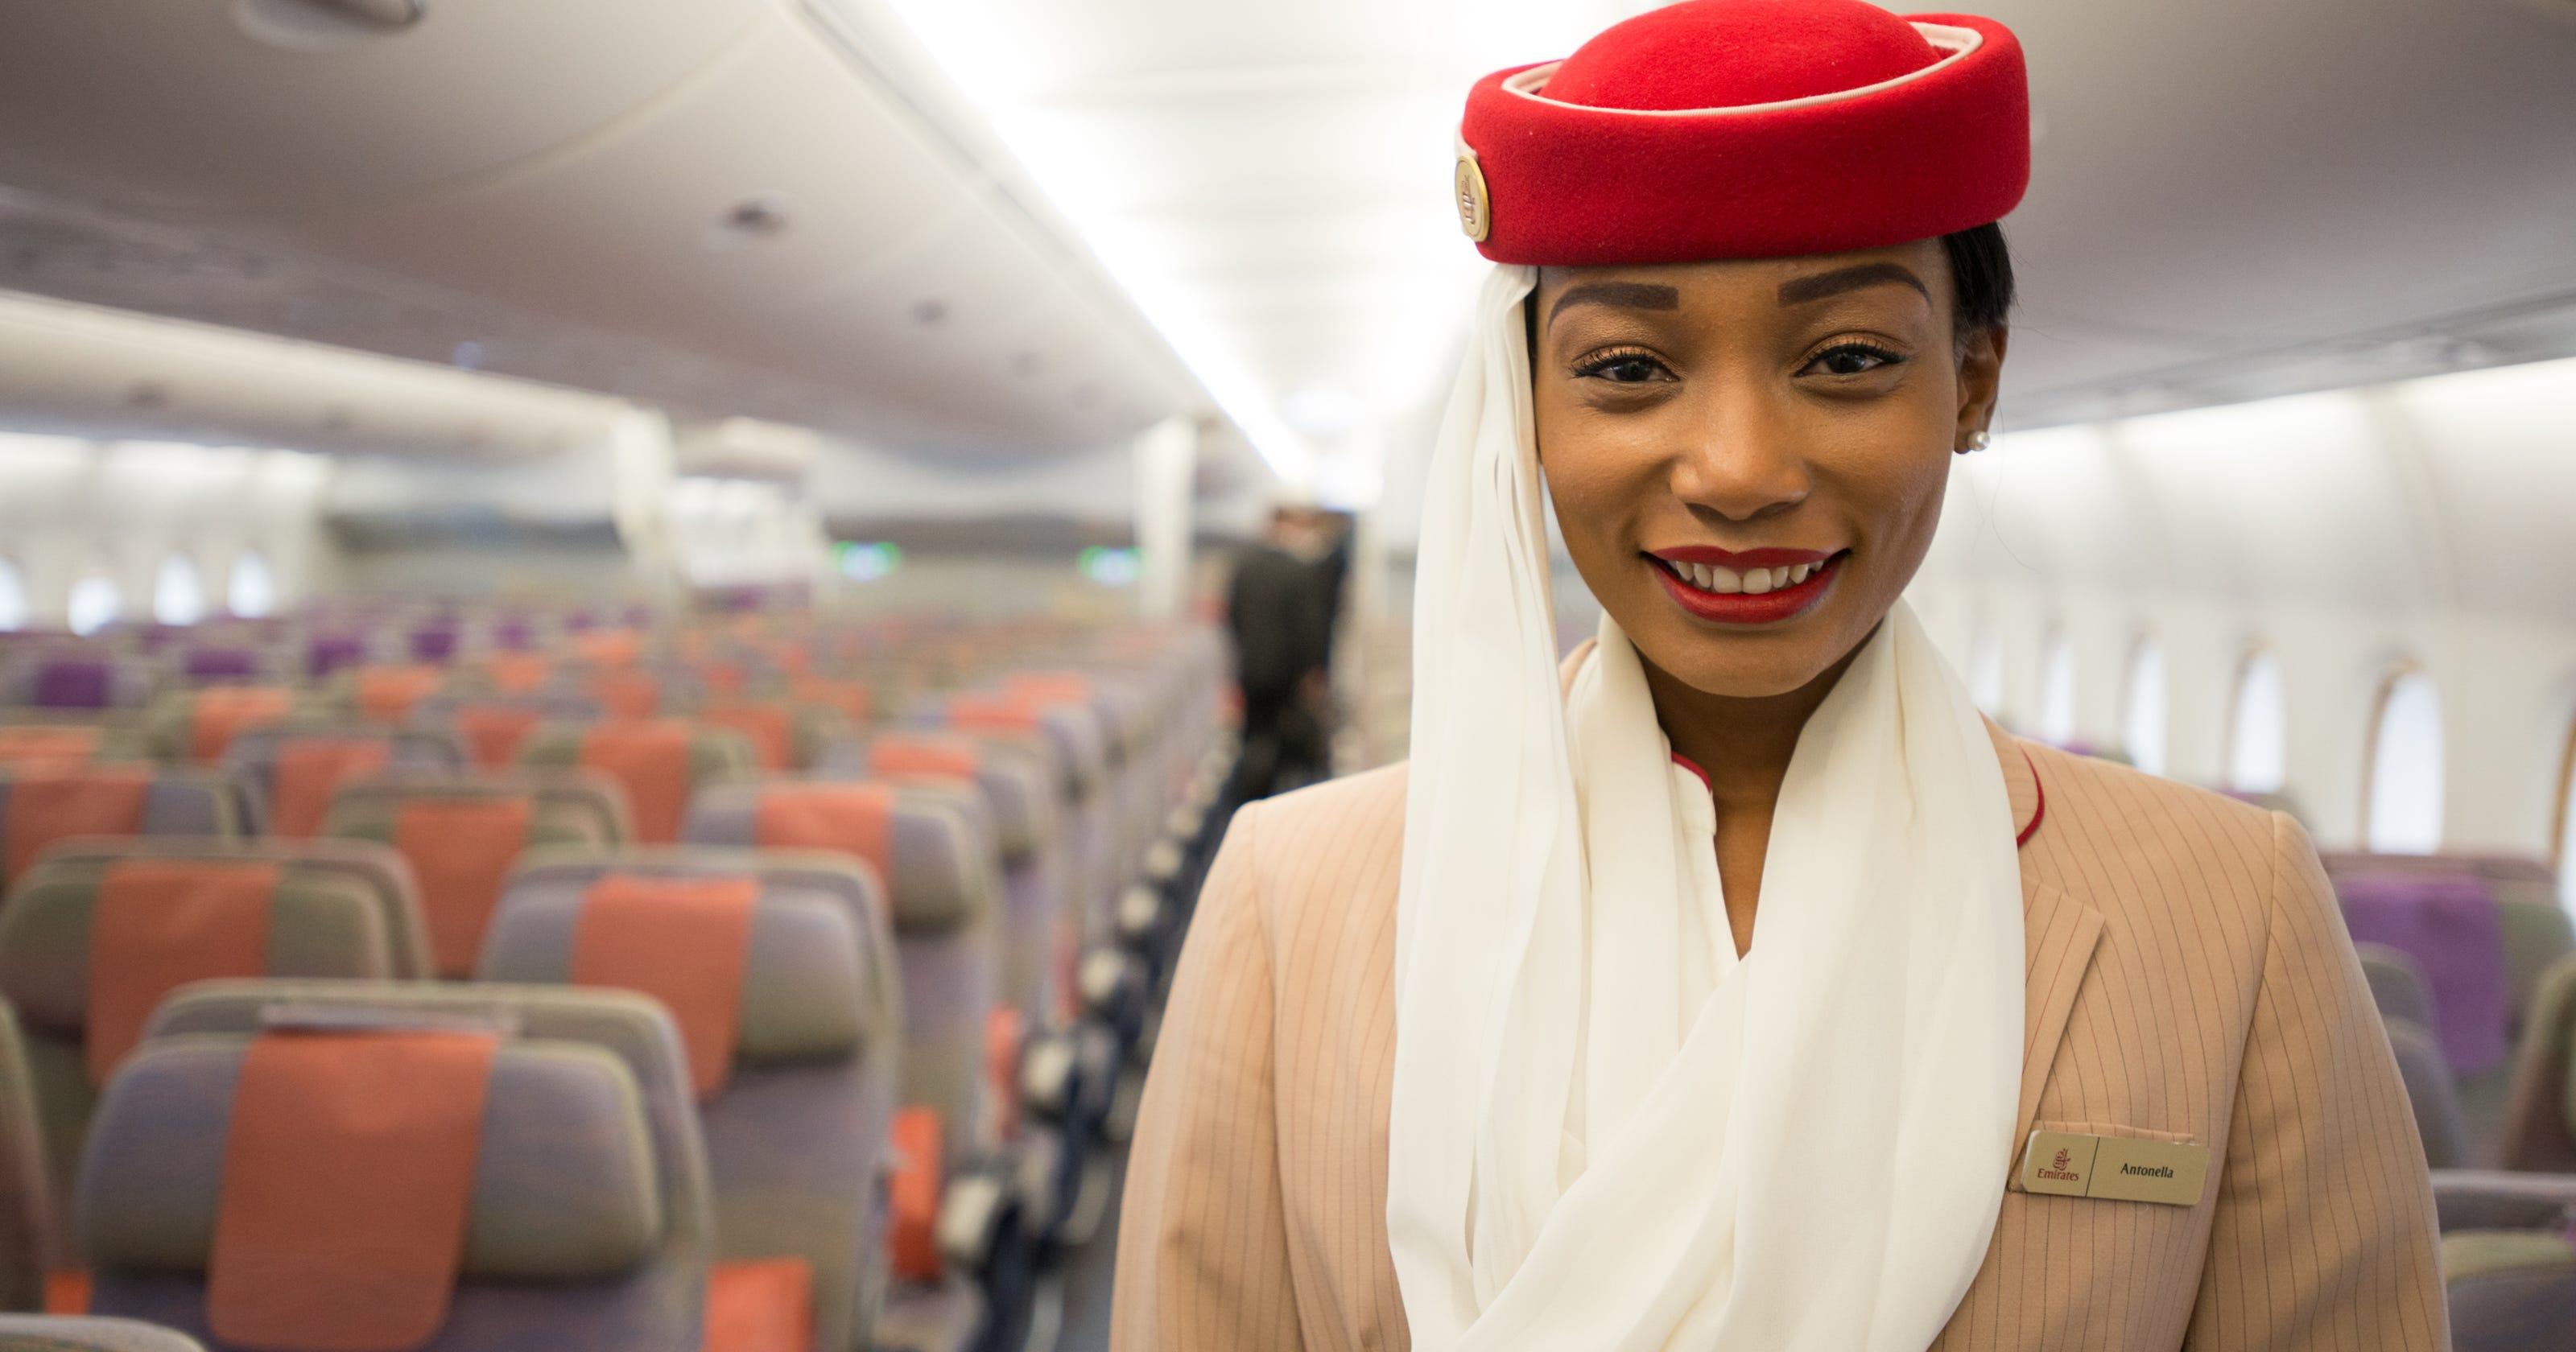 emirates senior vice president - HD2342×2002